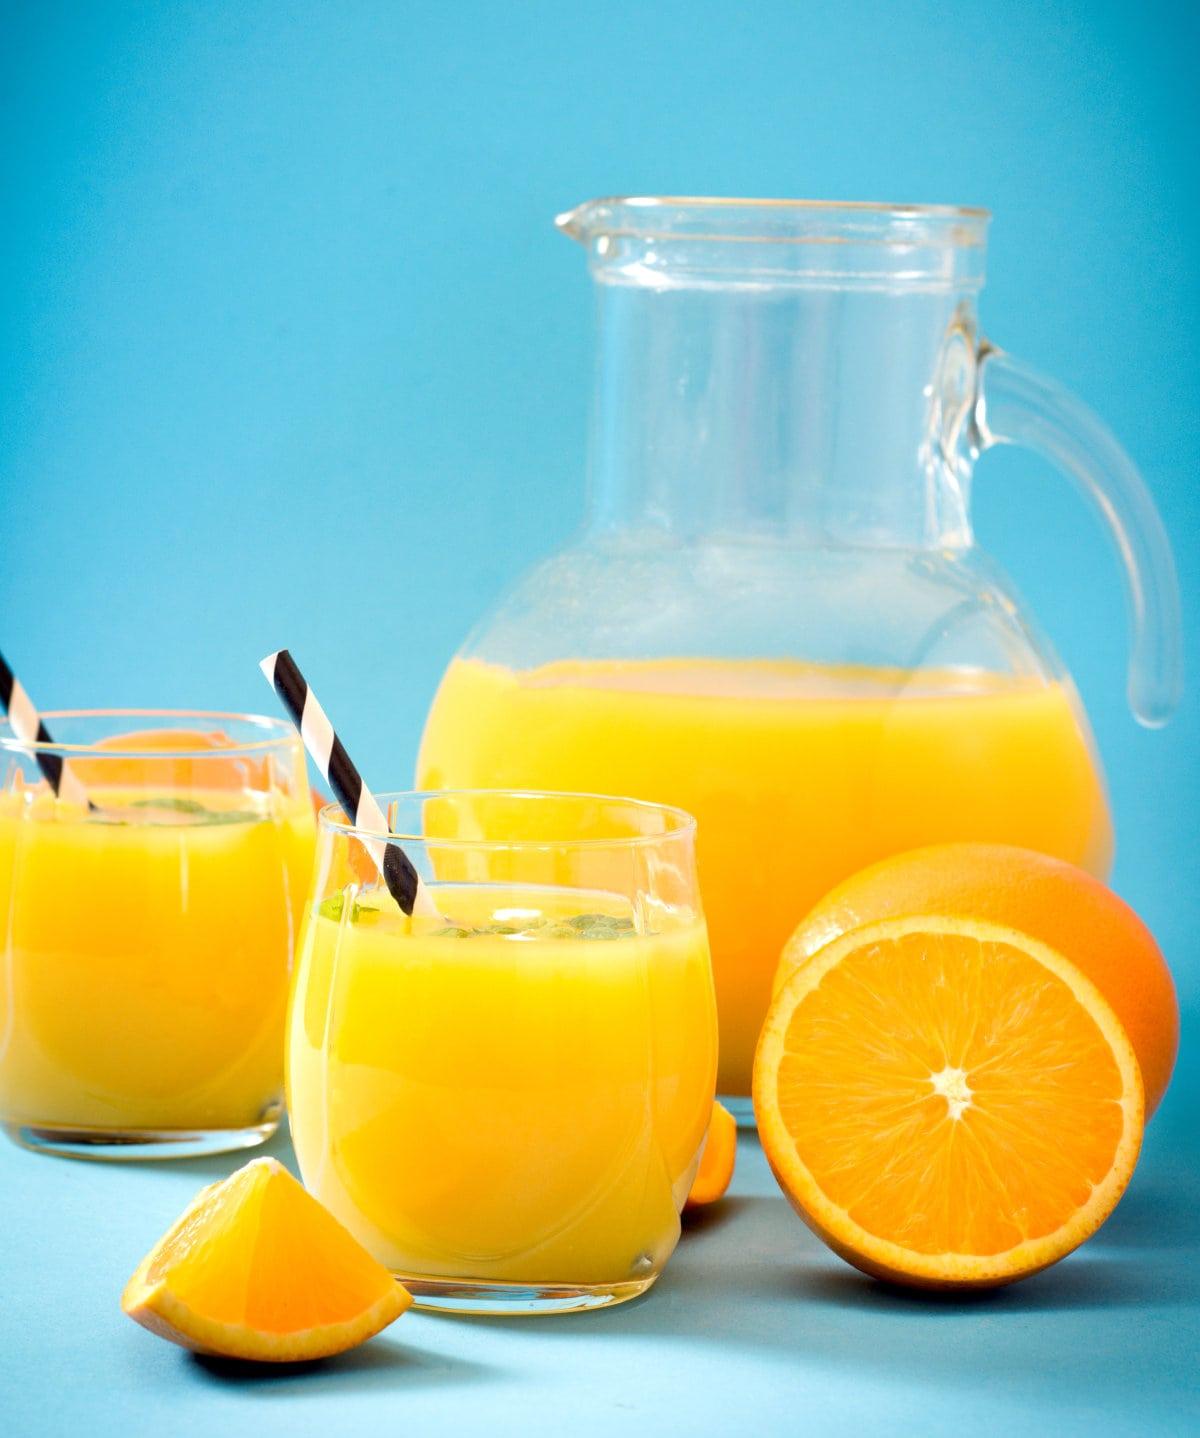 Orange Juice Pitcher